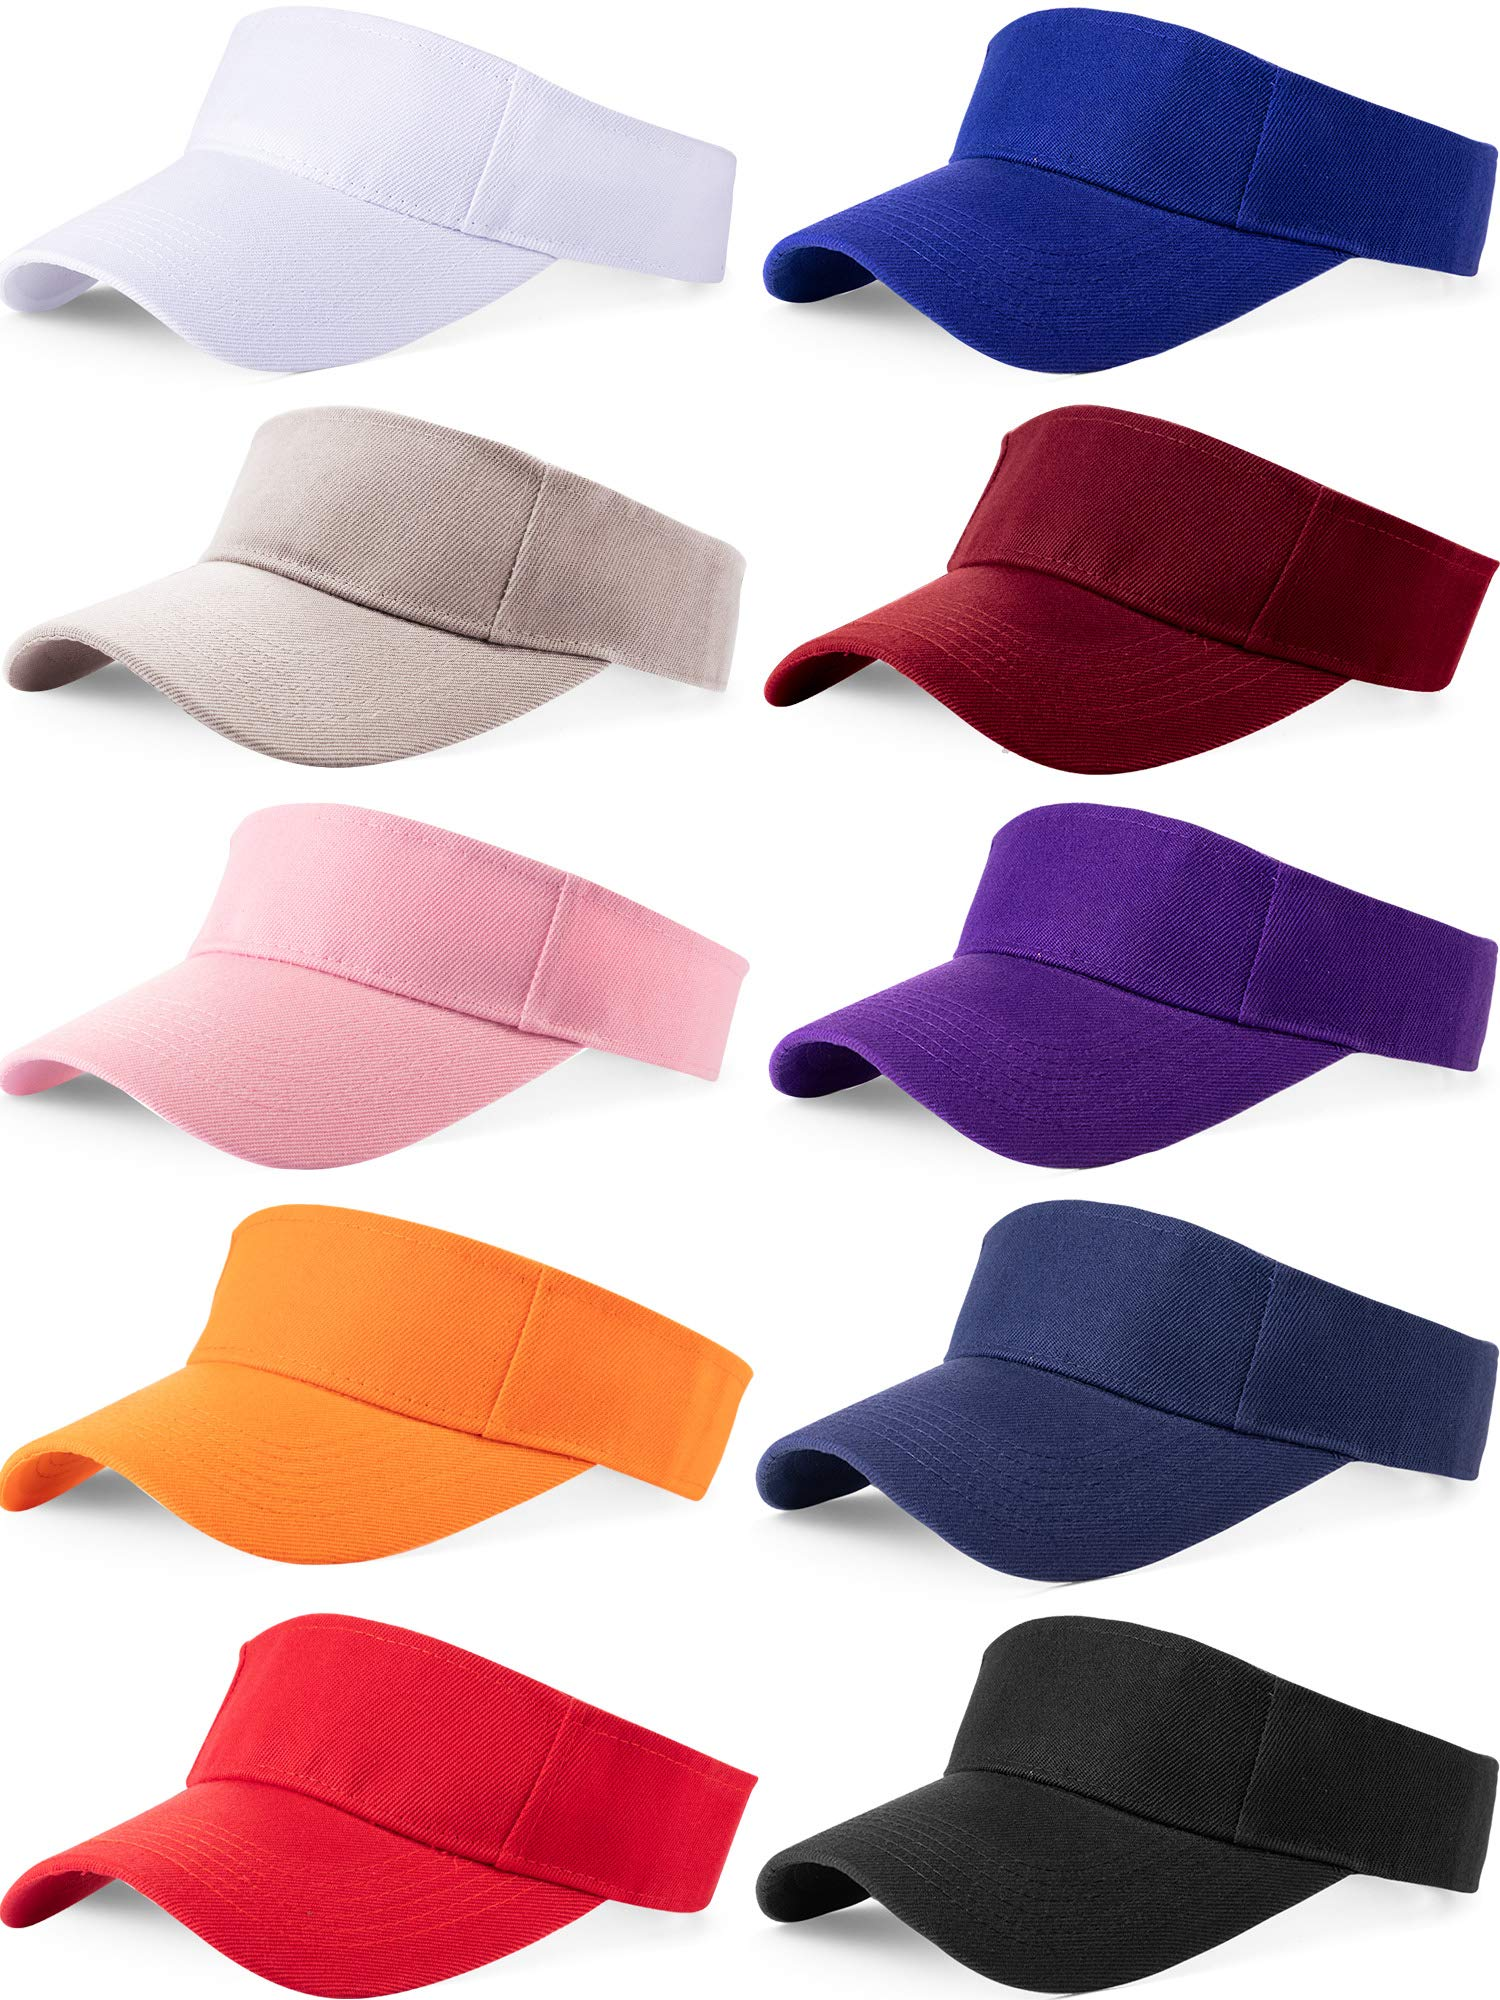 10 Pieces Sports Sun Visor Hats Adjustable Visor Cap Athletic Visor Hat for Men Women by SATINIOR